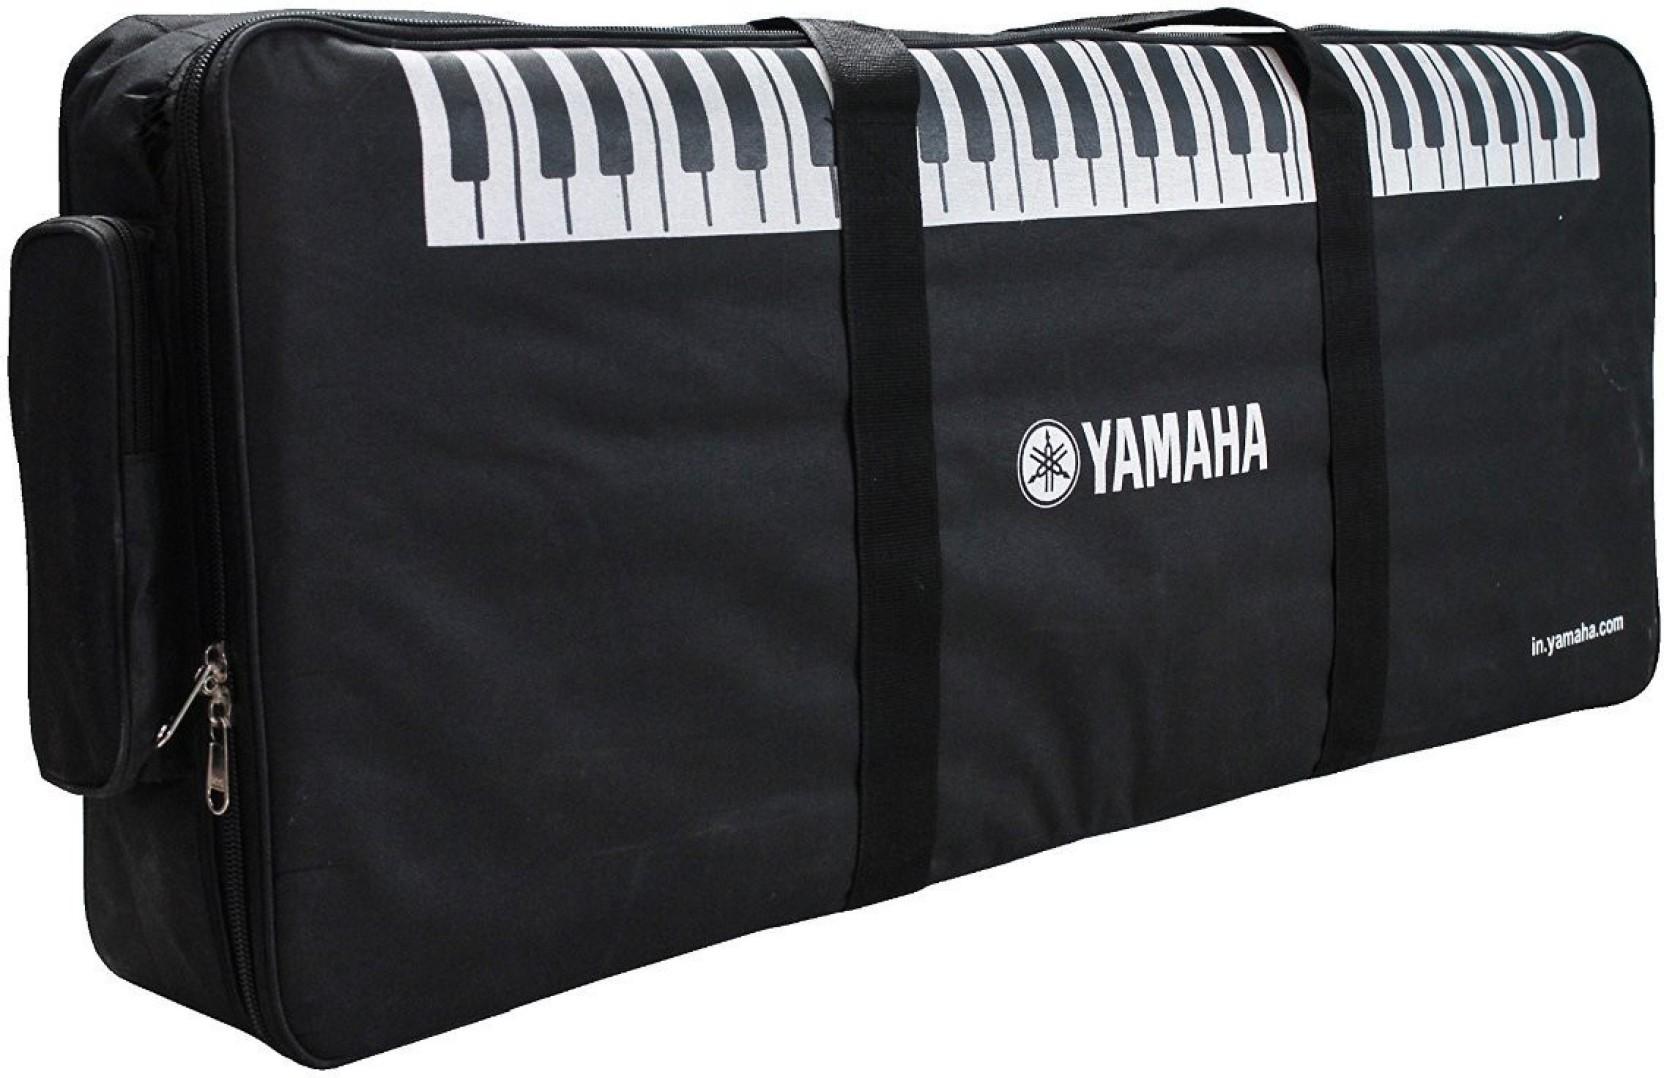 246920f011 Yamaha PSR-I455 Keyboard Bag Price in India - Buy Yamaha PSR-I455 ...